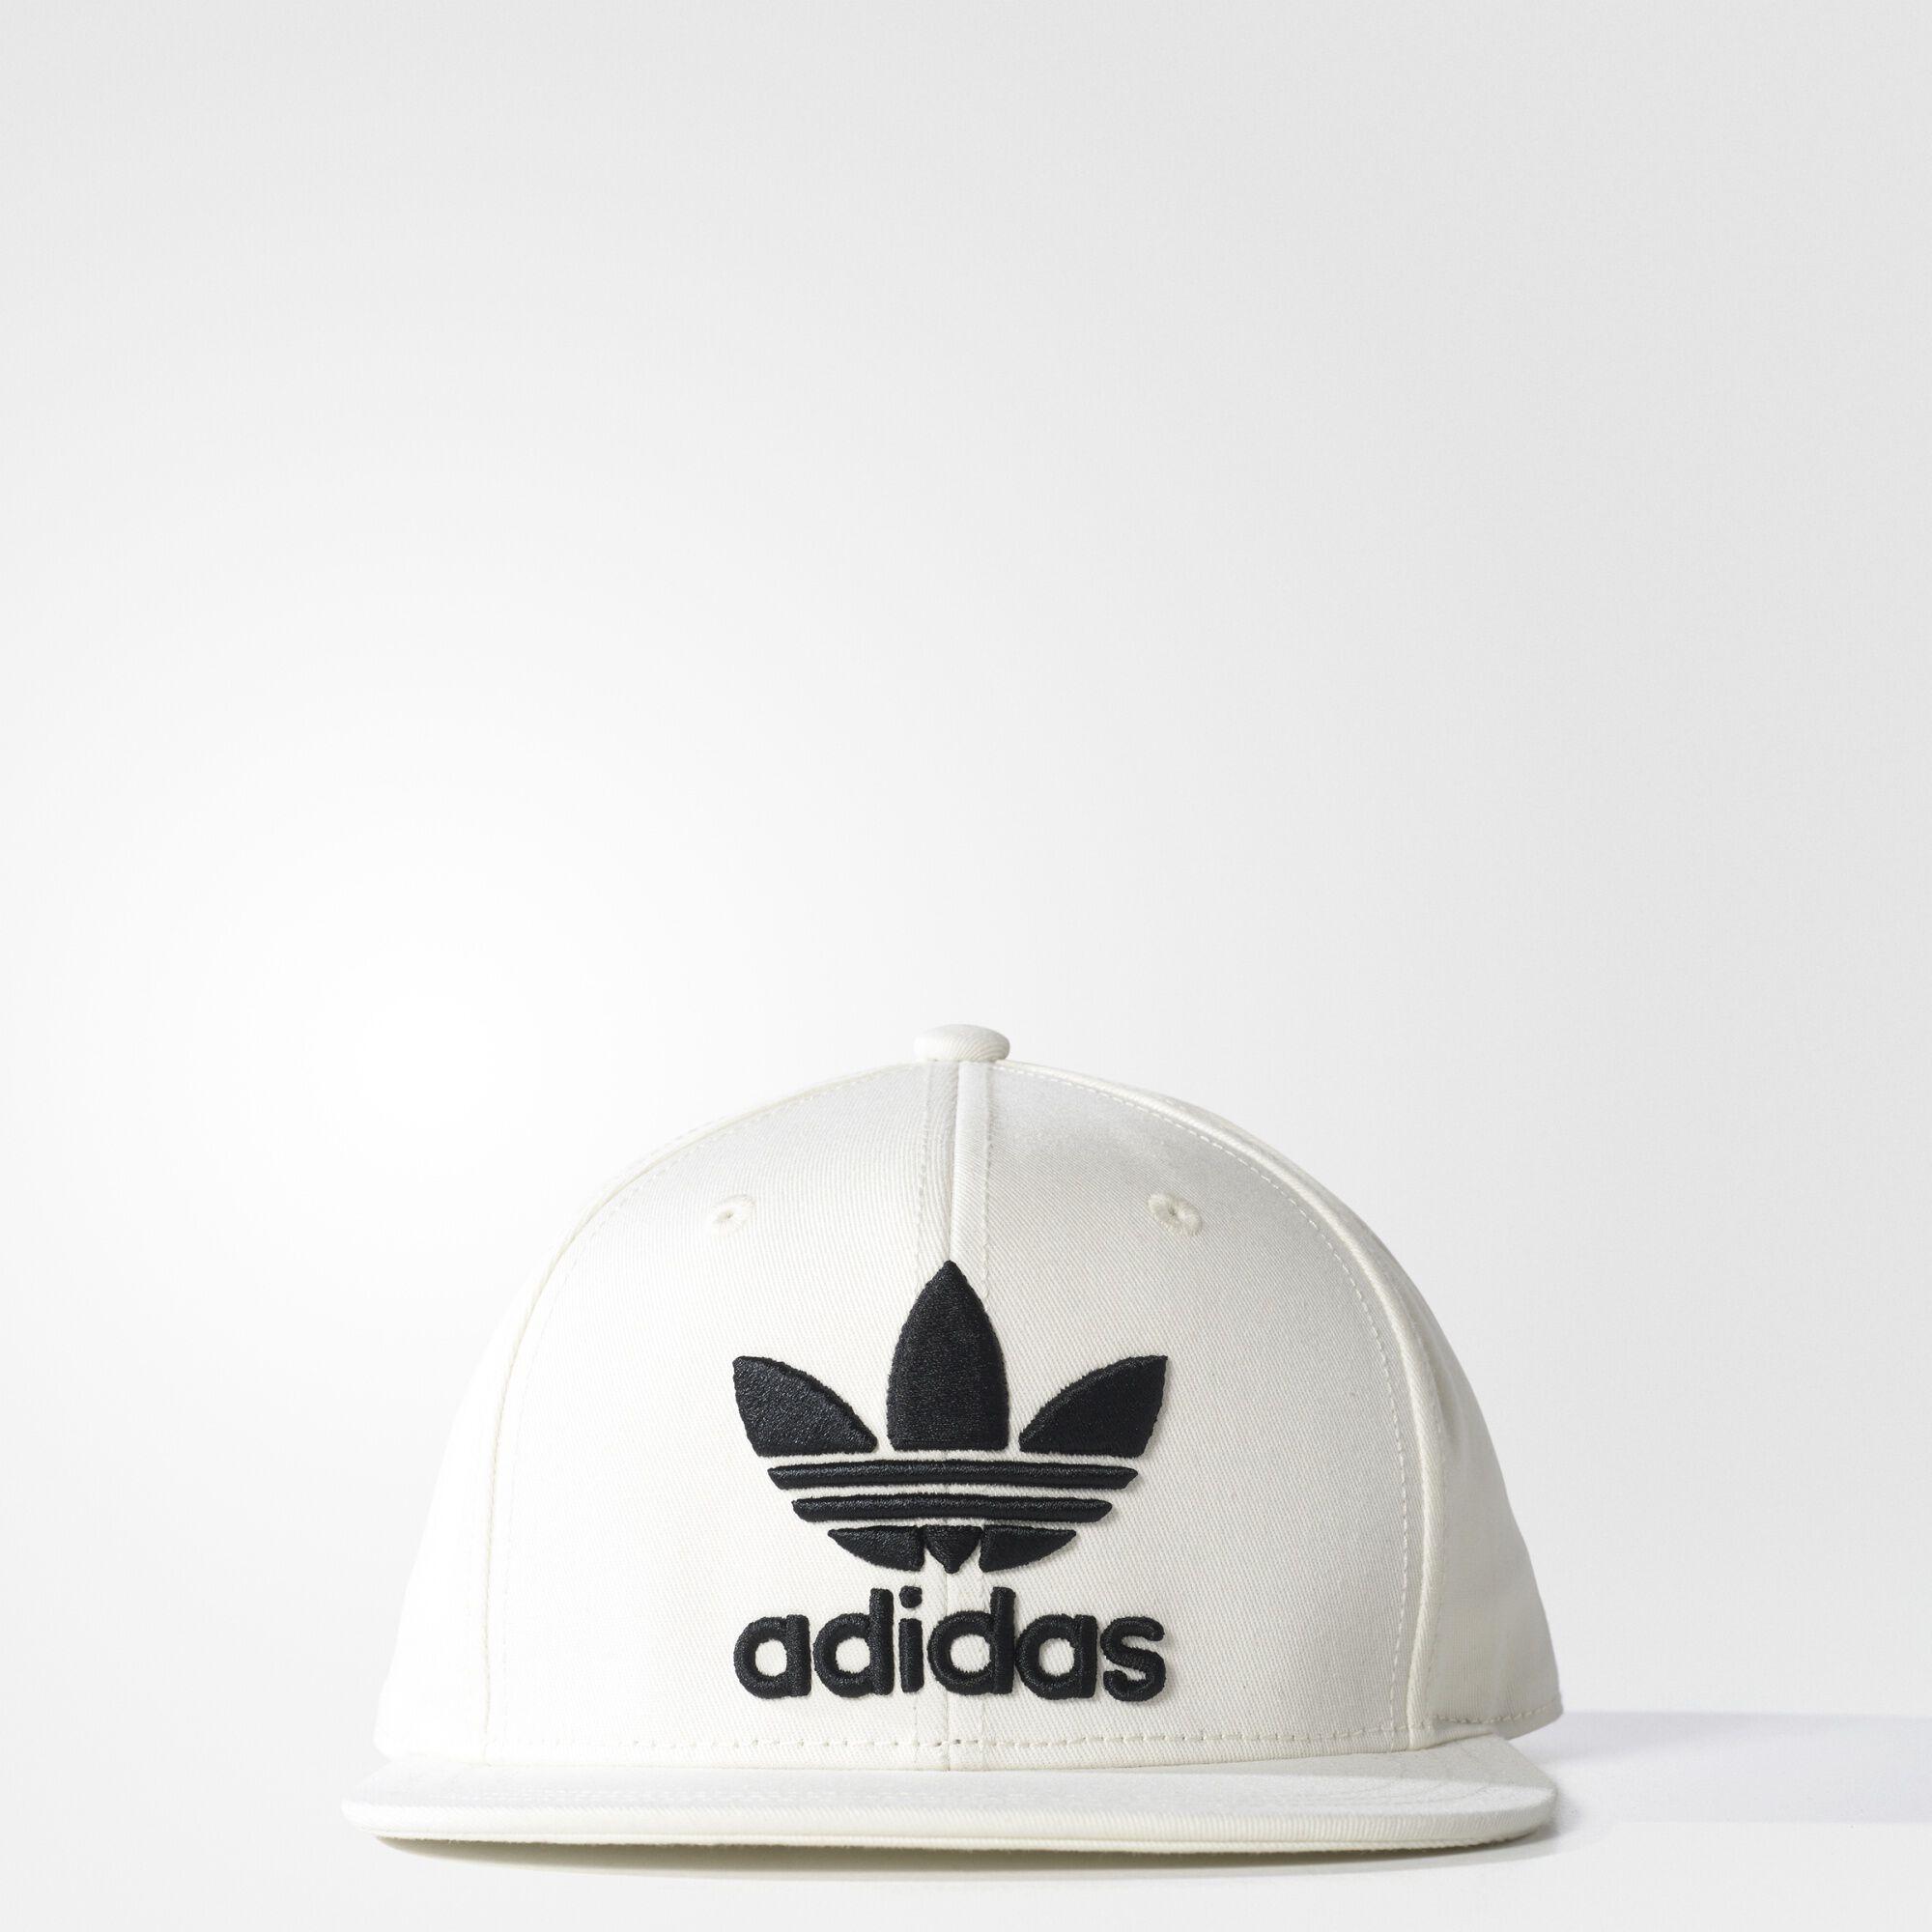 89118b0a6ff9 Gorras Adidas Planas Blancas finaperf.es